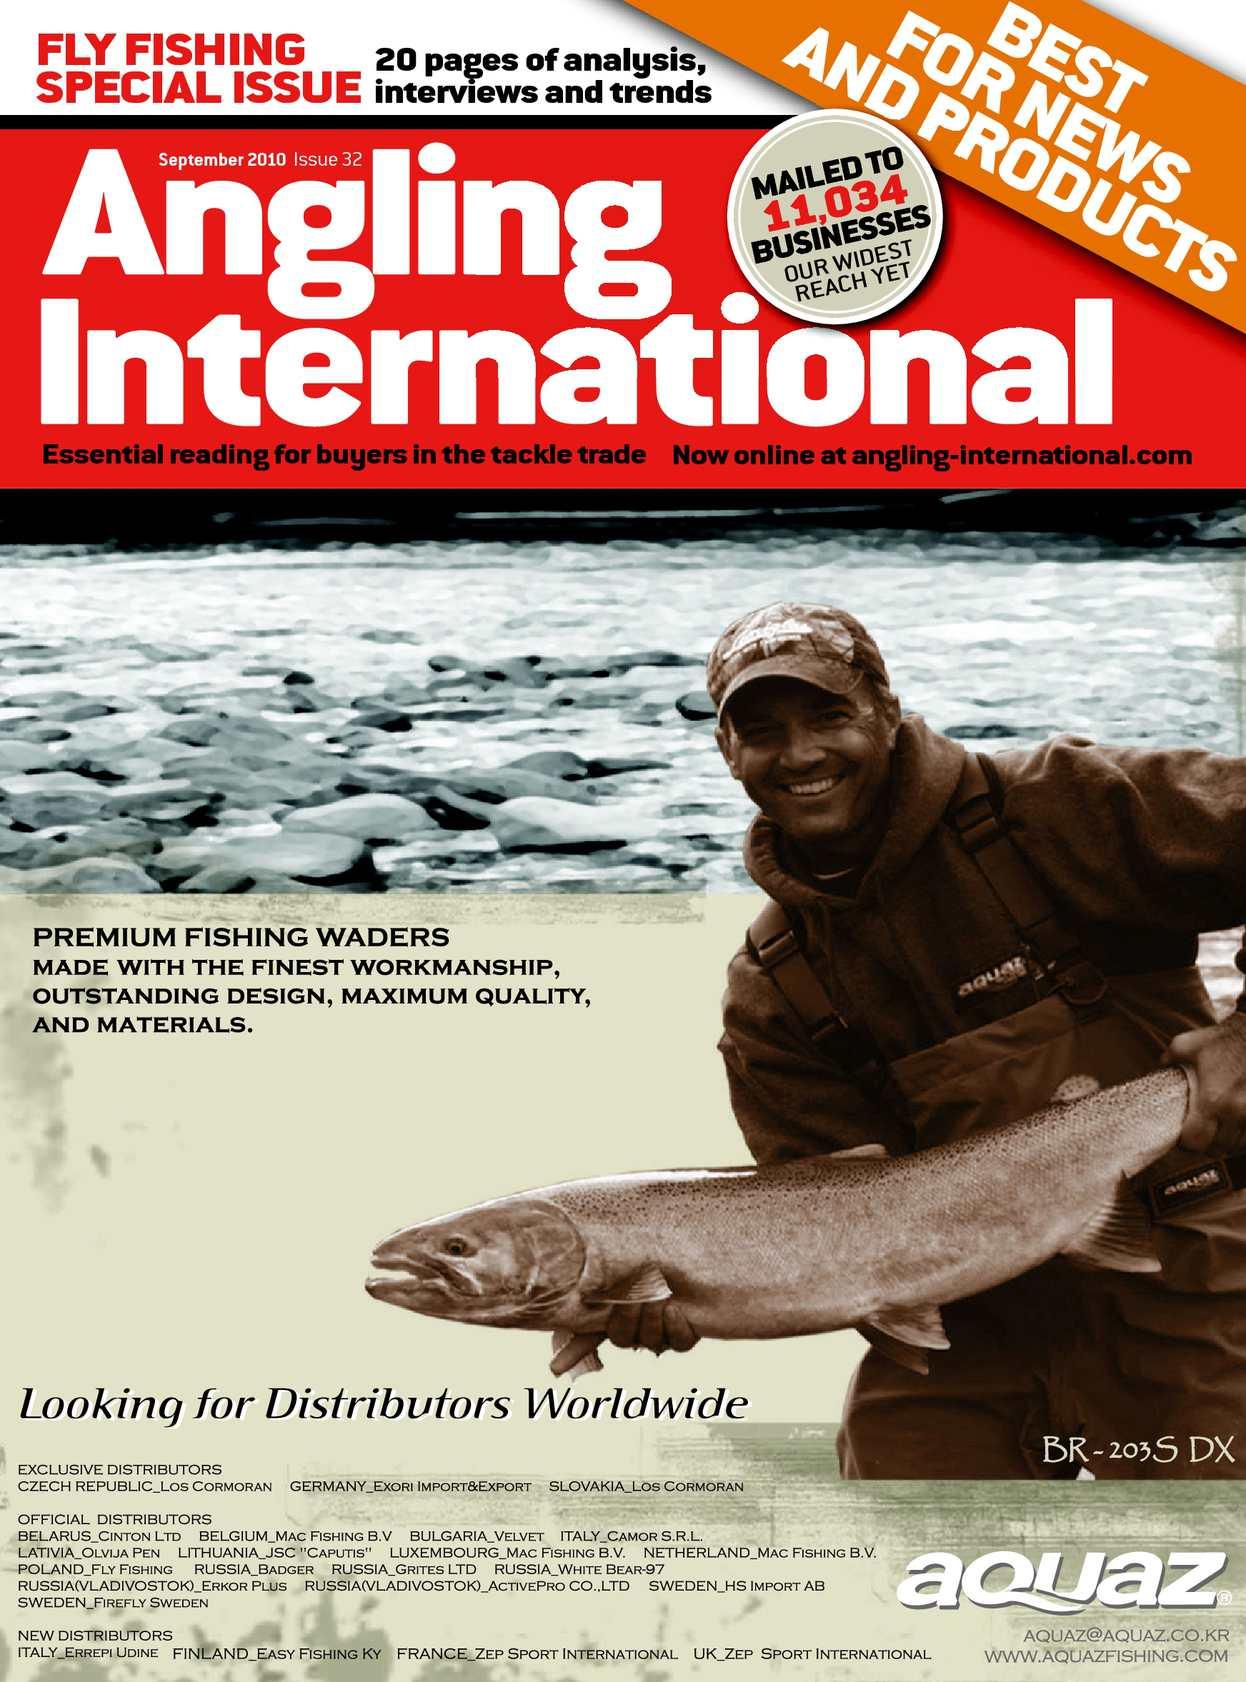 Carp Fishing Label Lightweight Aluminium Stage Stand BIVVY ANGLERS